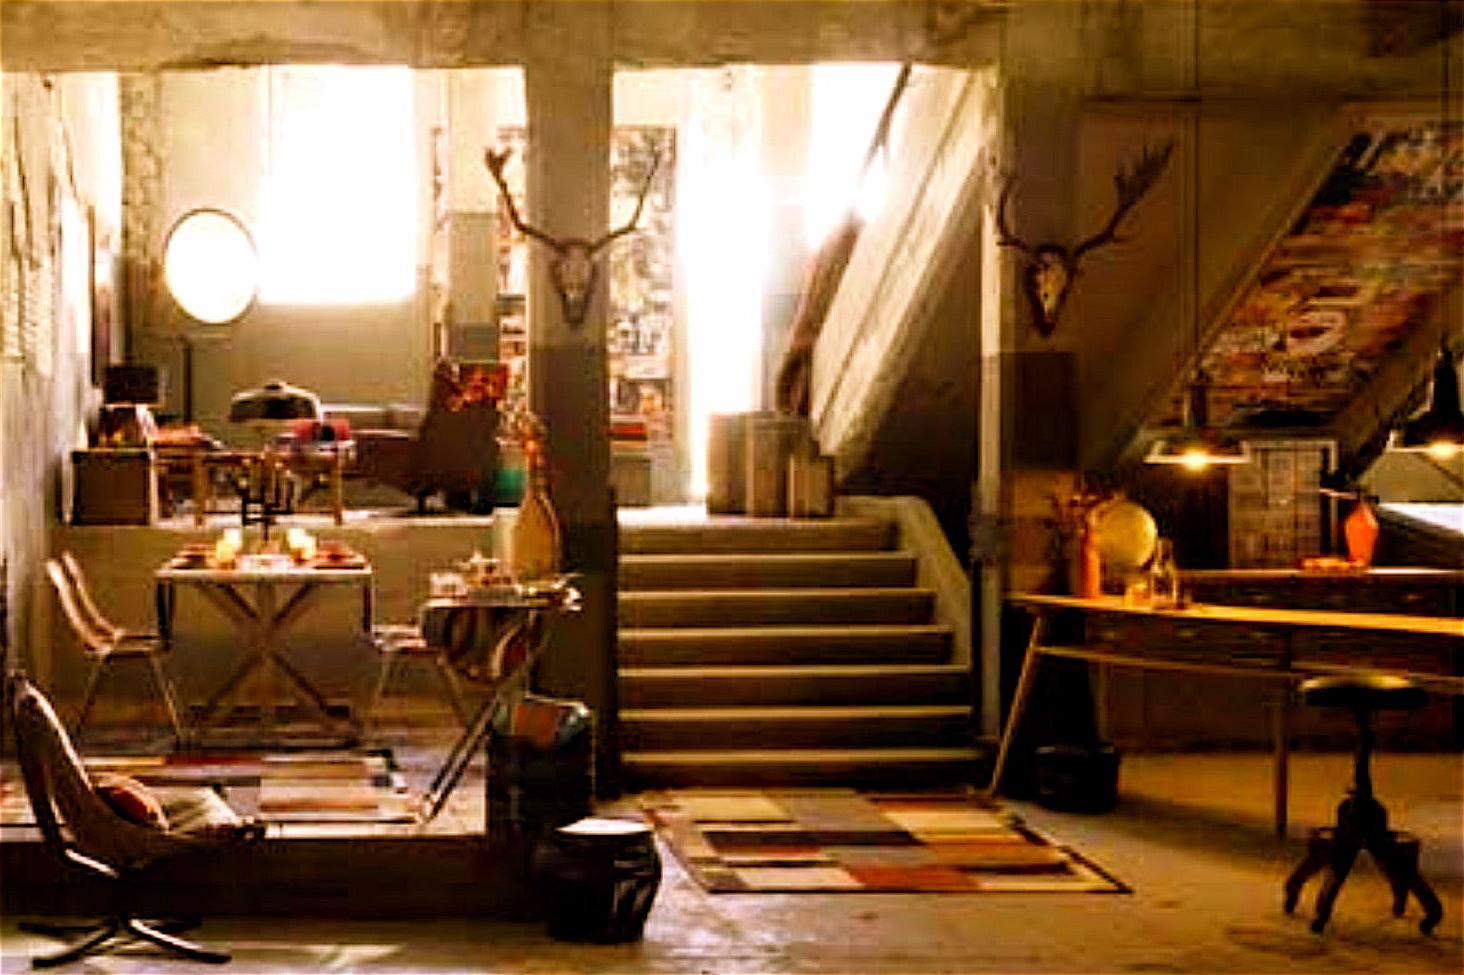 bohemian rustic  Urban Lifestyle Decor furniture  wares for the urban dweller